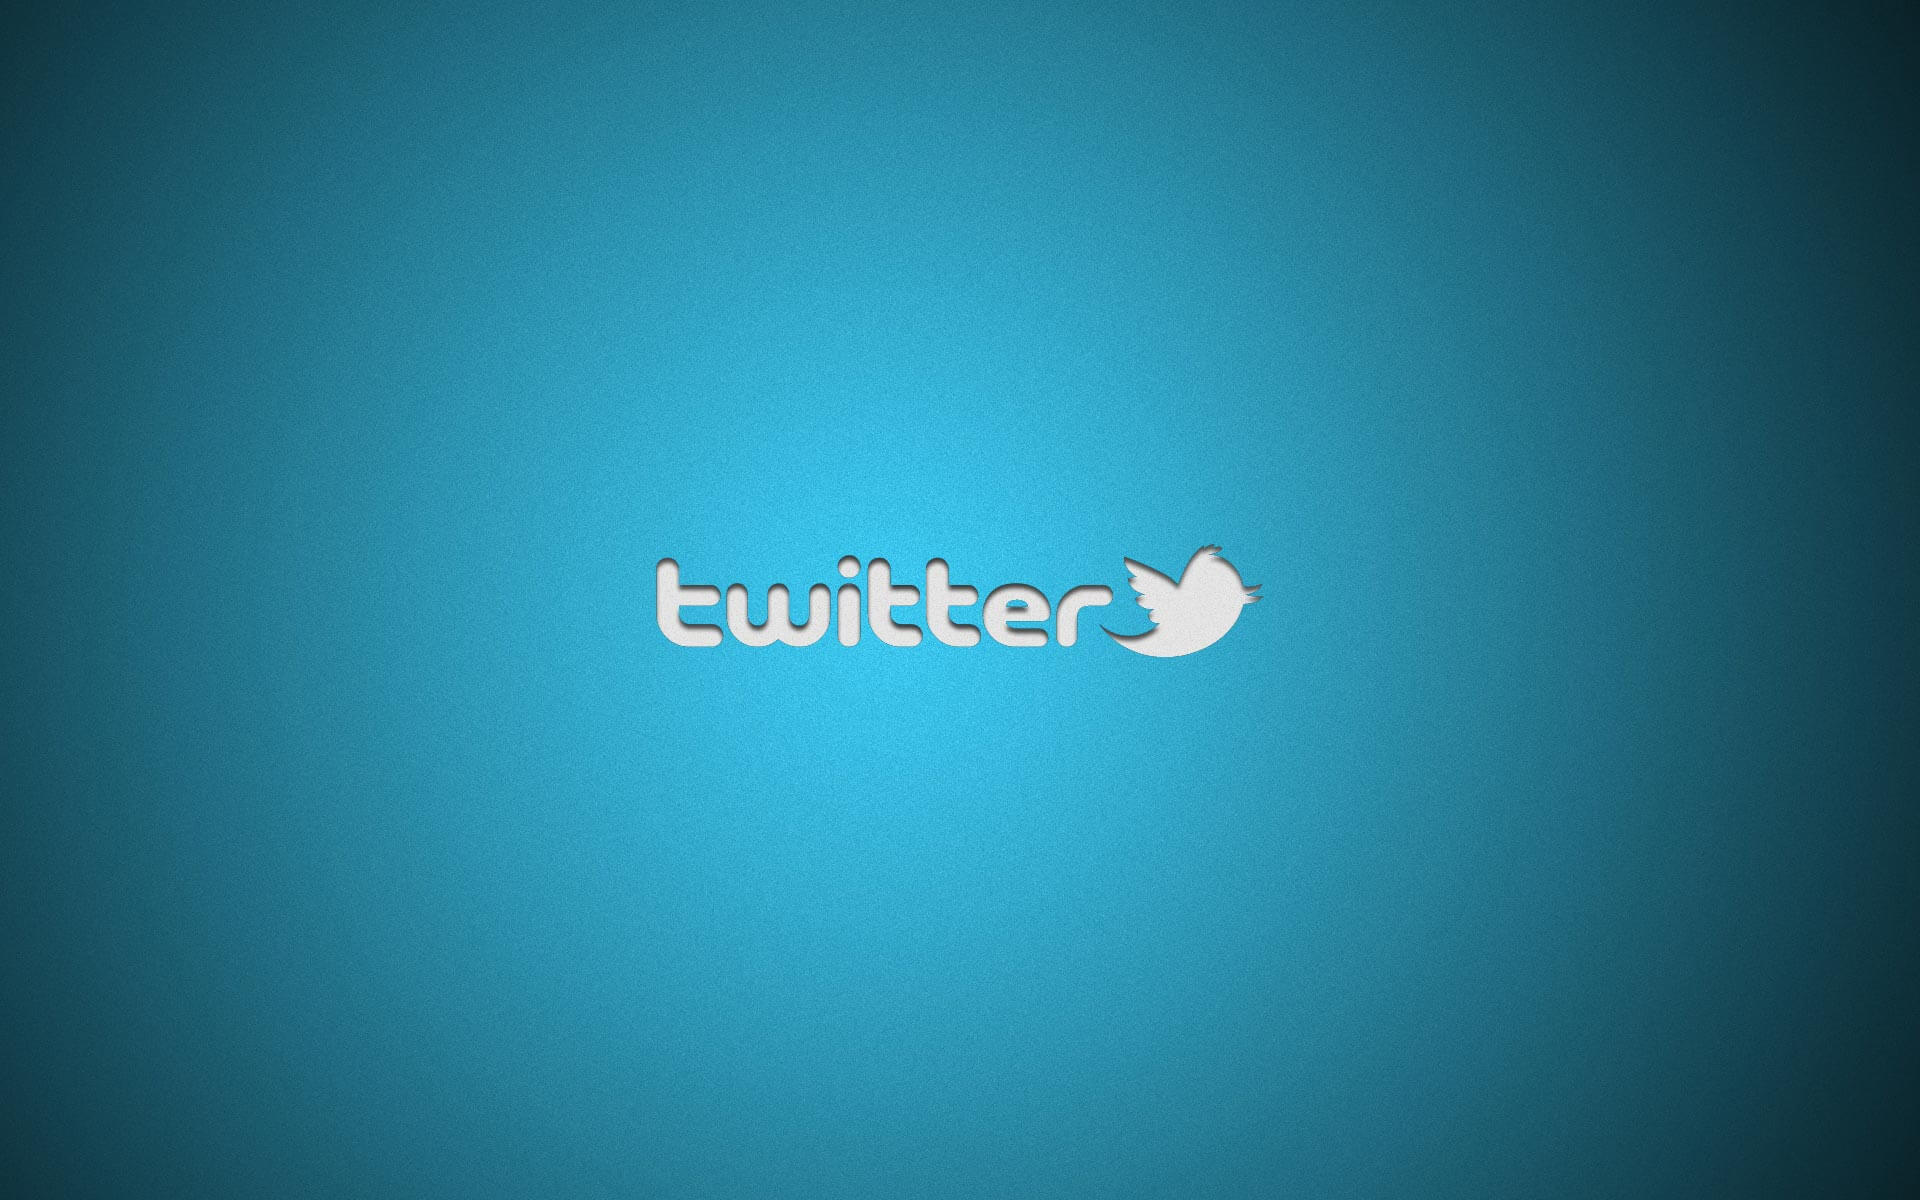 twitter-background.jpg